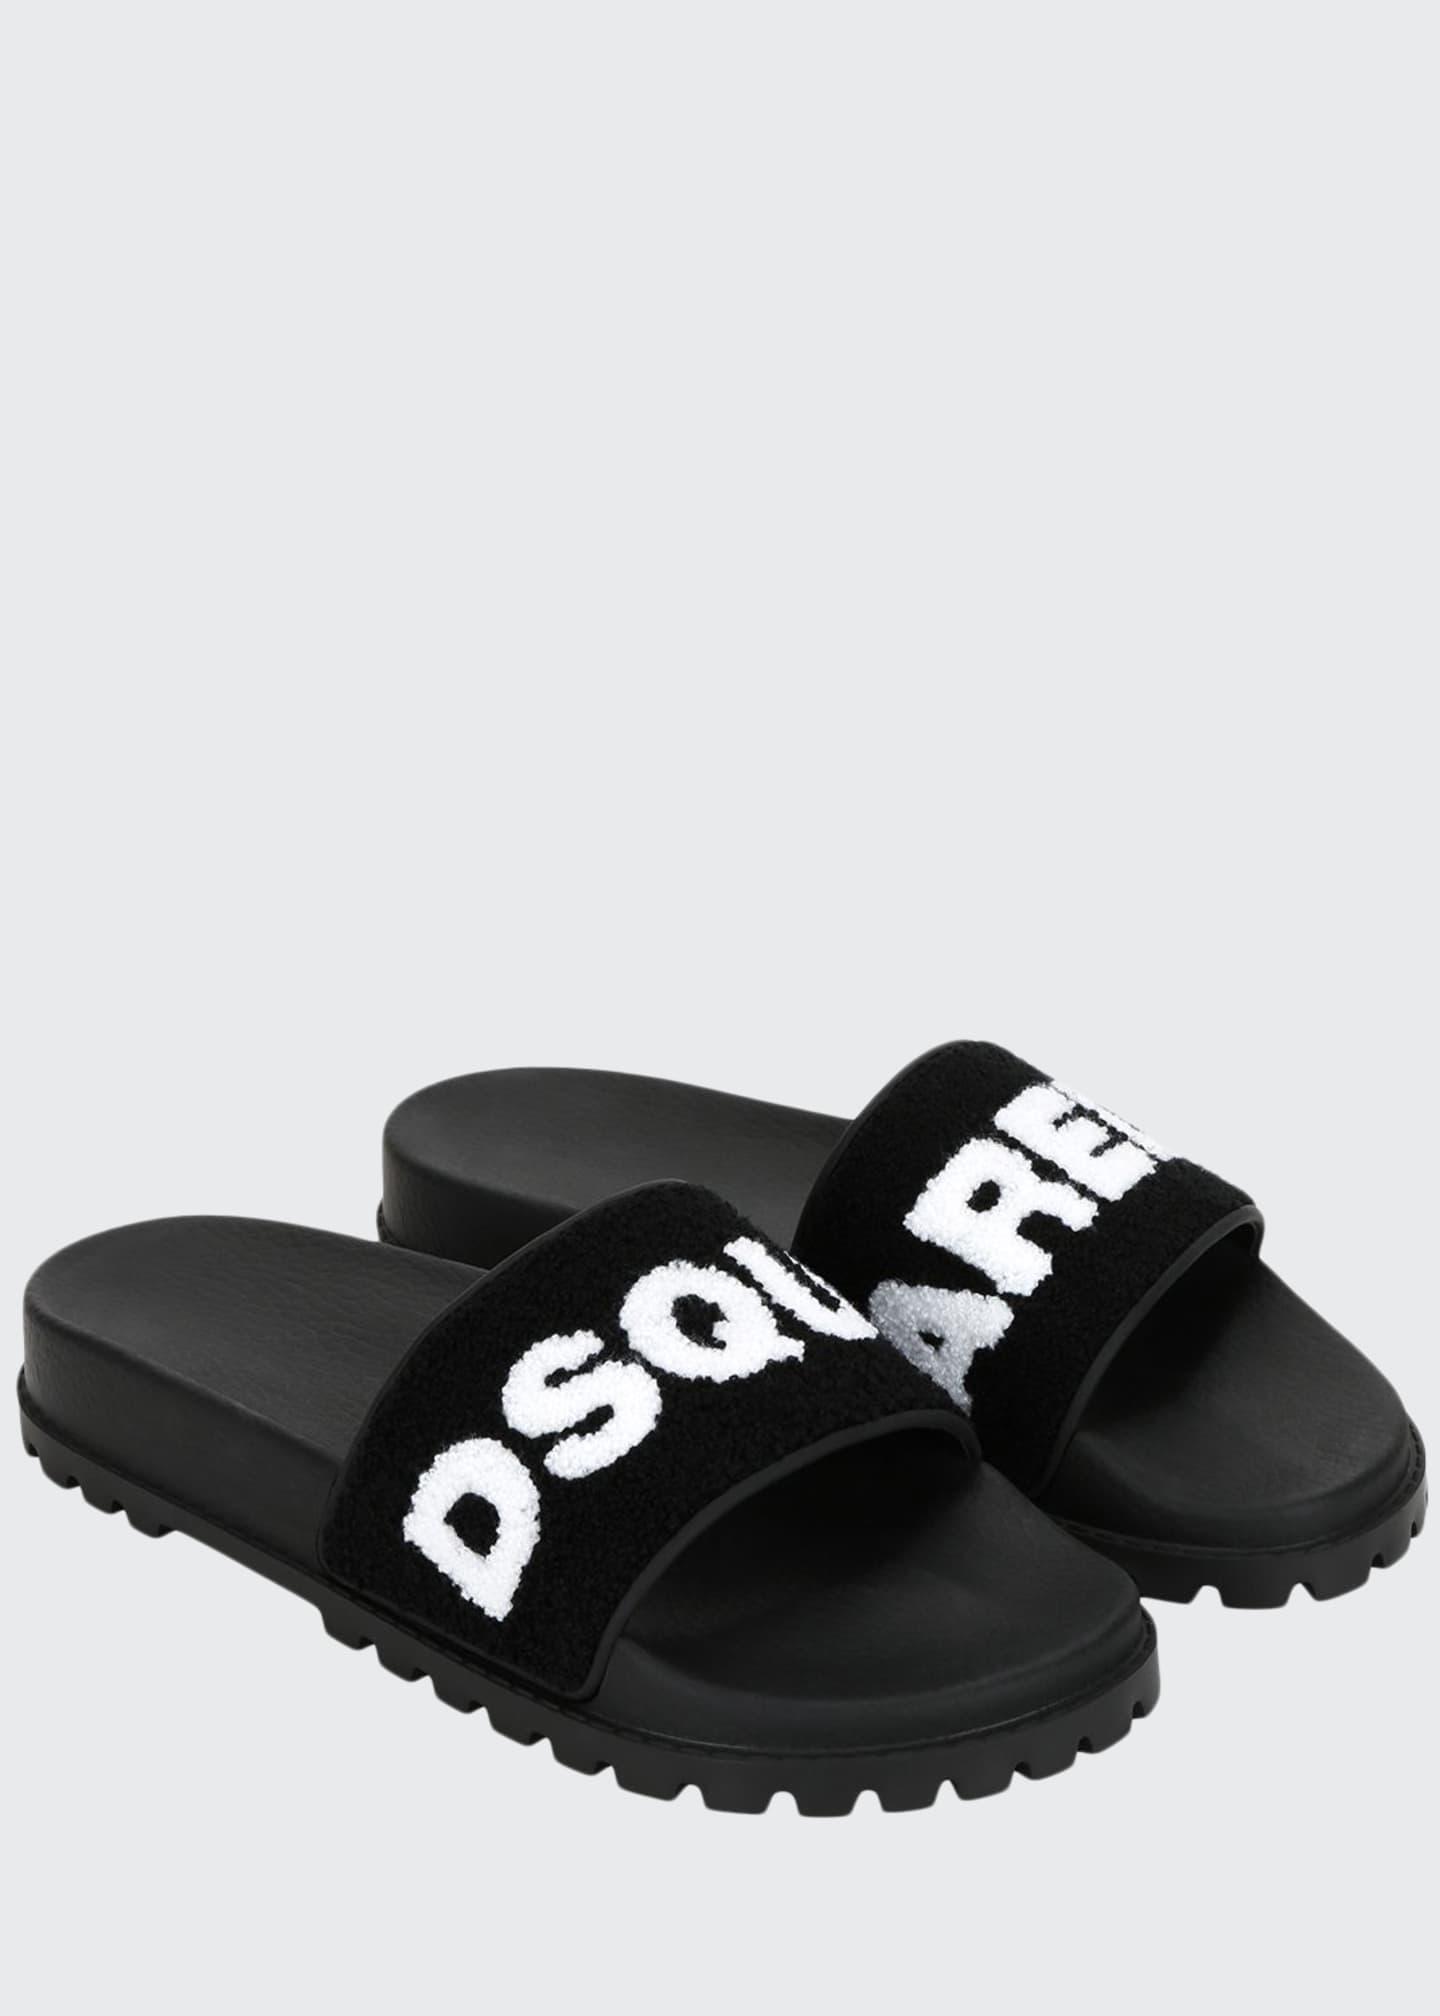 Dsquared2 Men's Terry Logo Slide Sandals